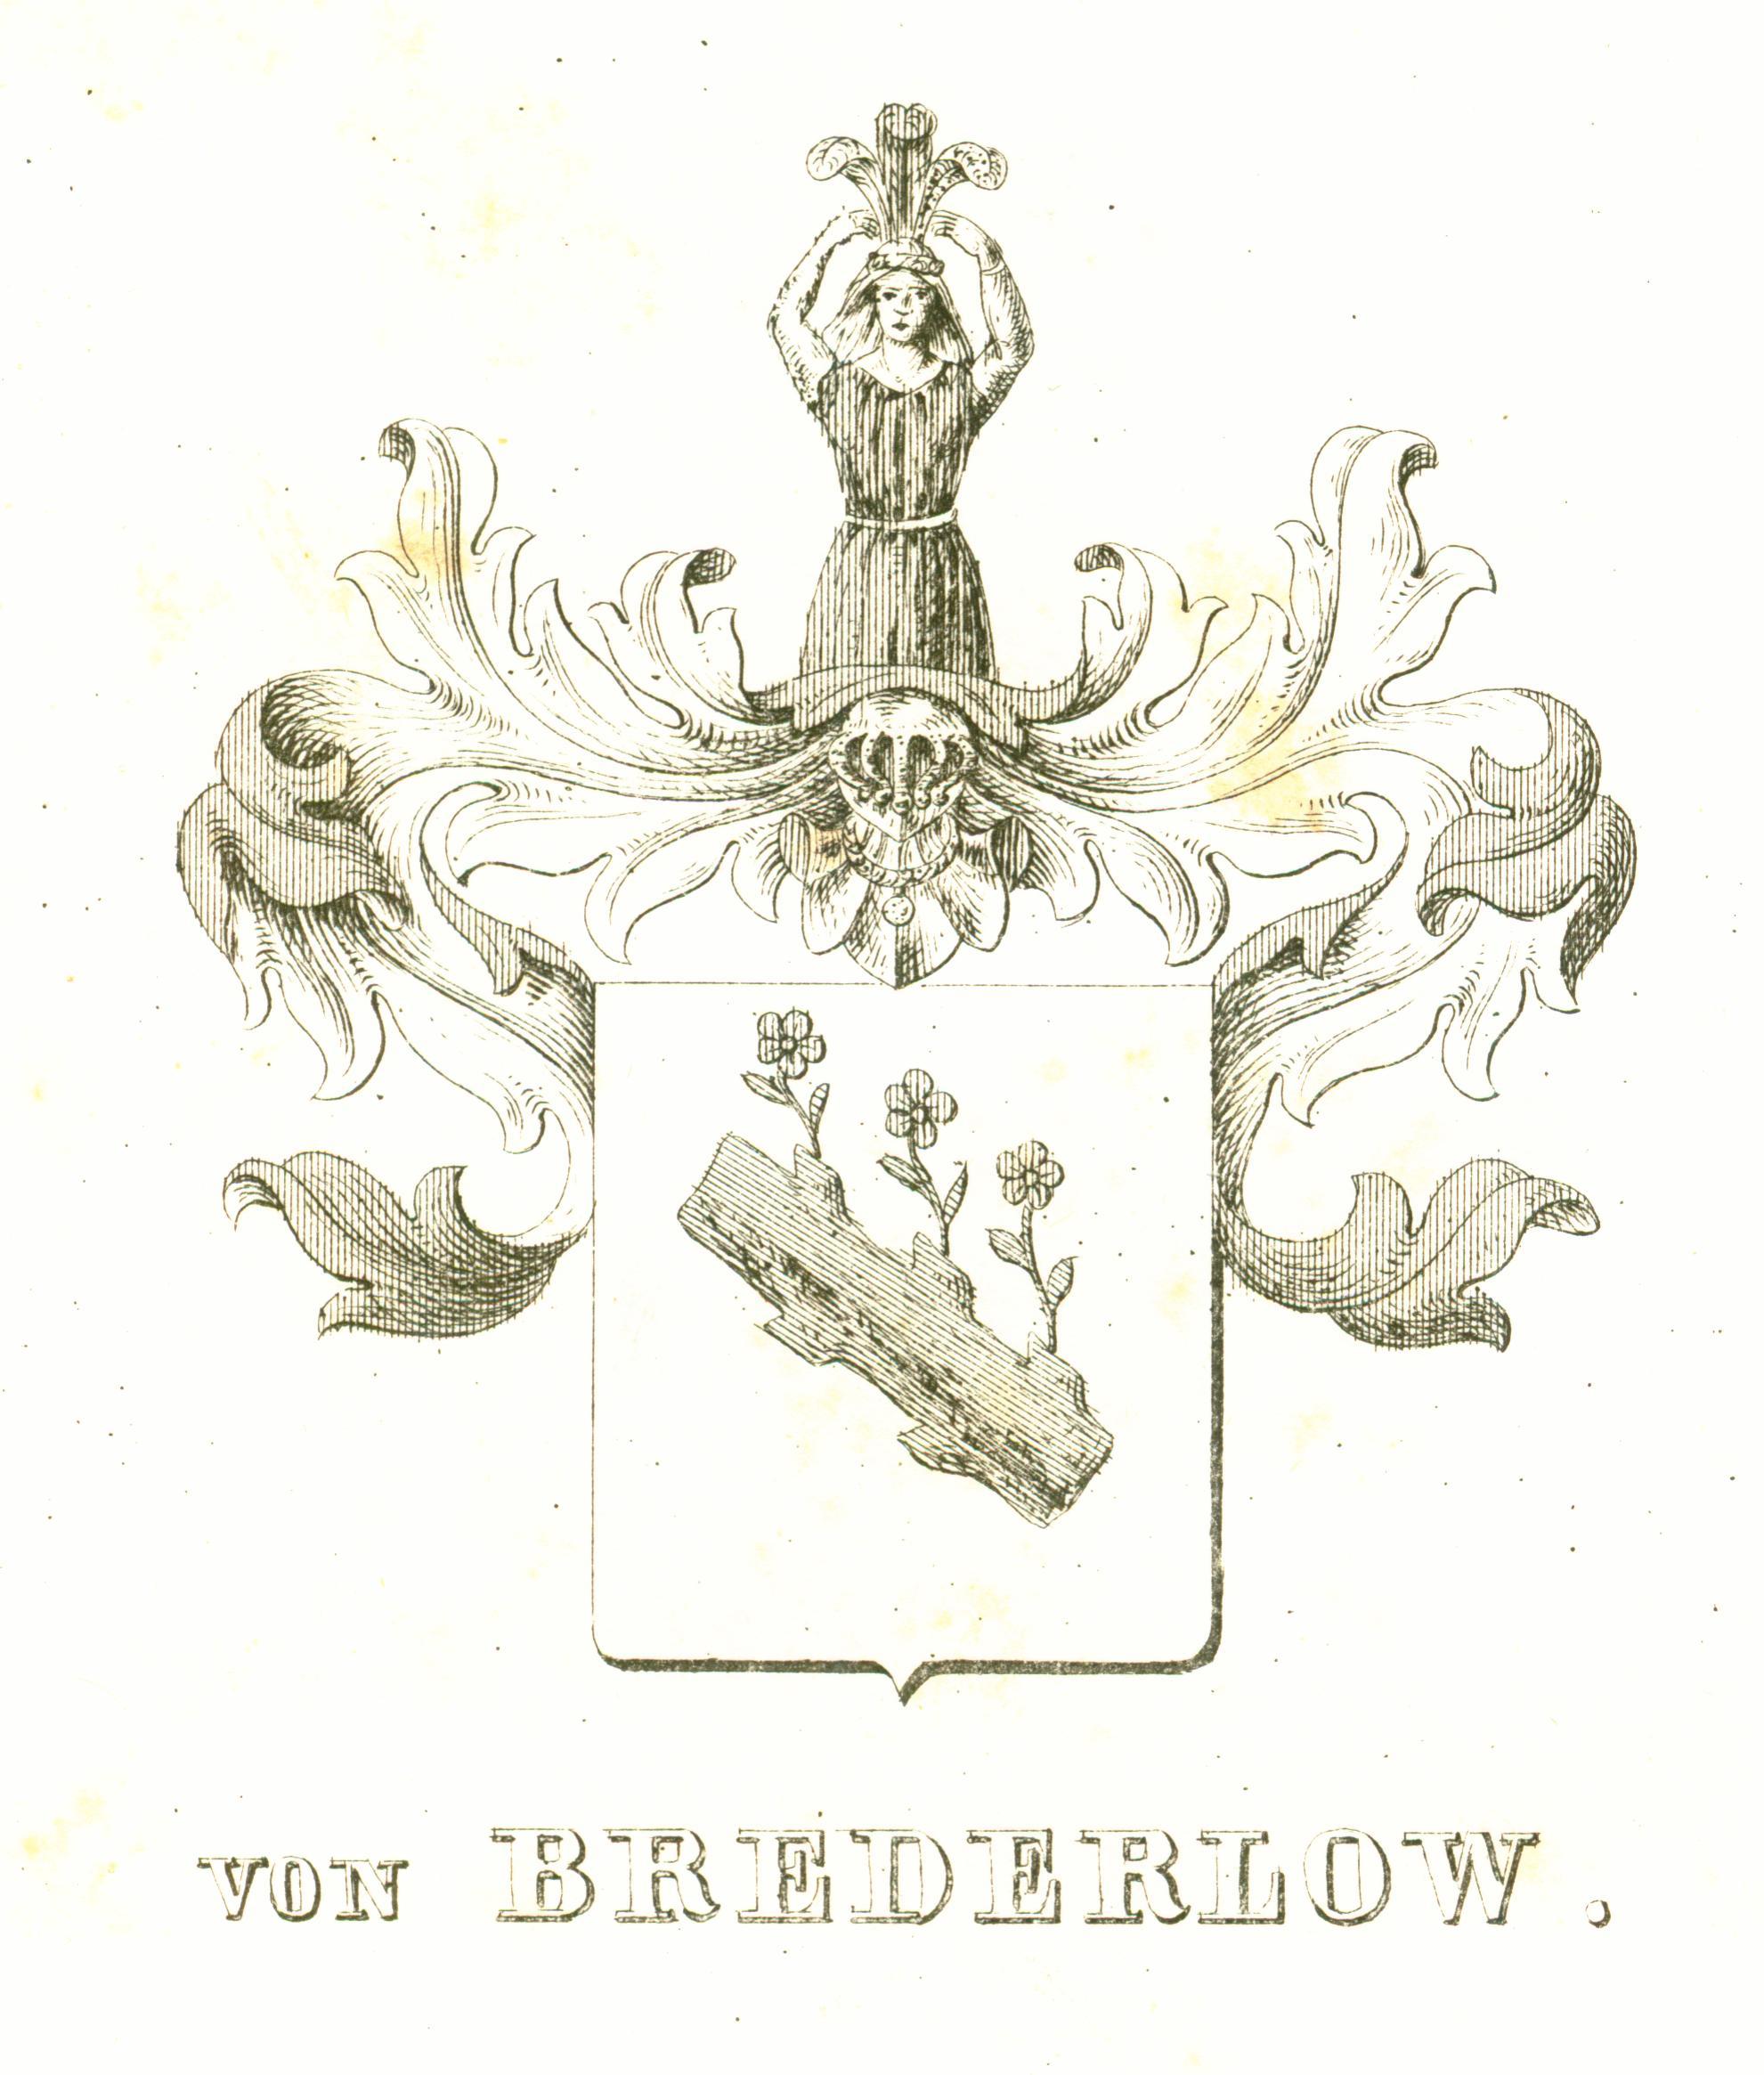 Brederlow